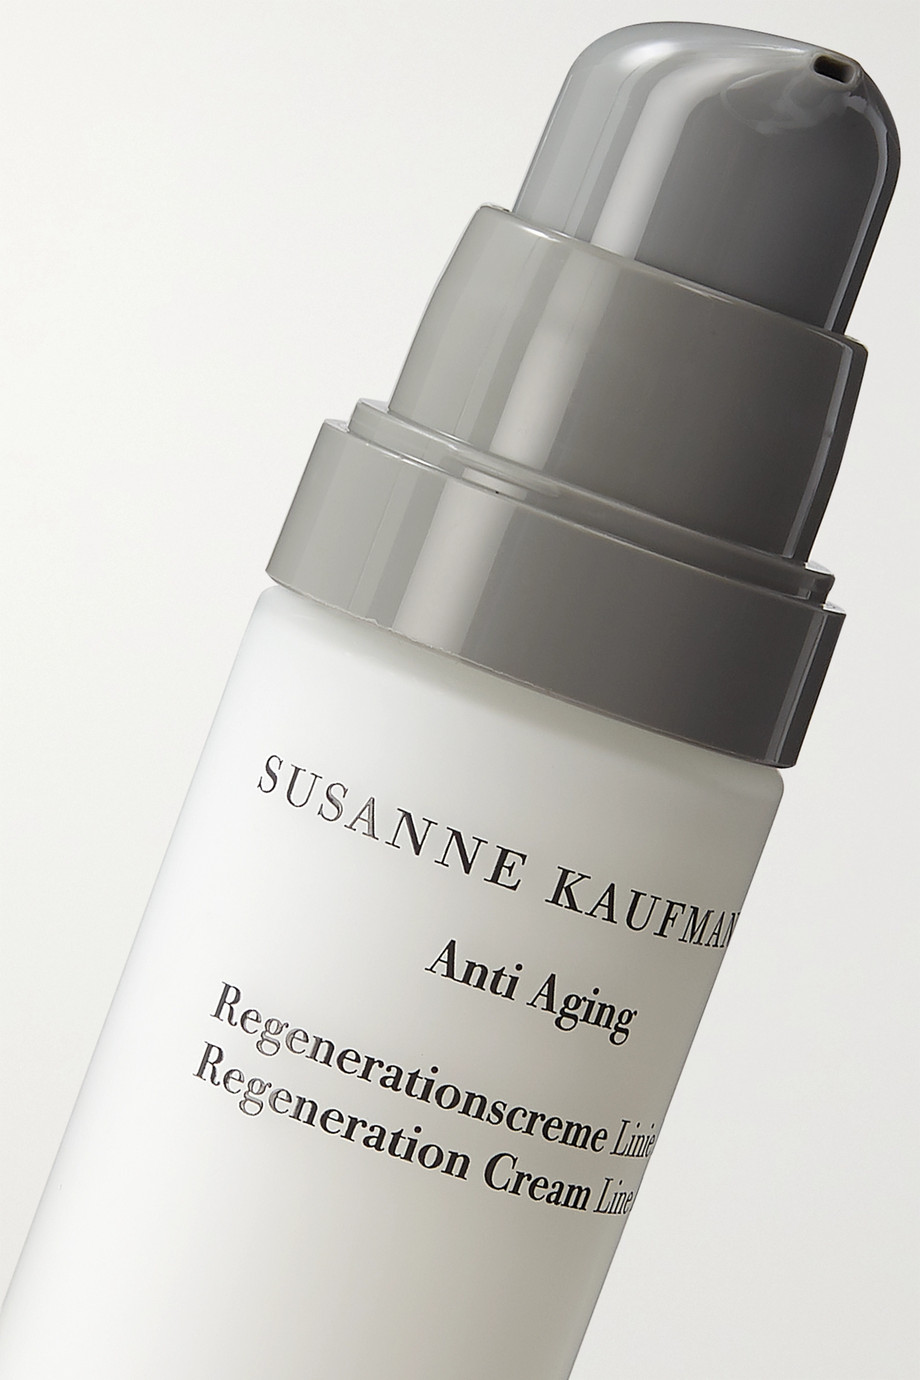 Susanne Kaufmann Regeneration Cream Line A, 50ml